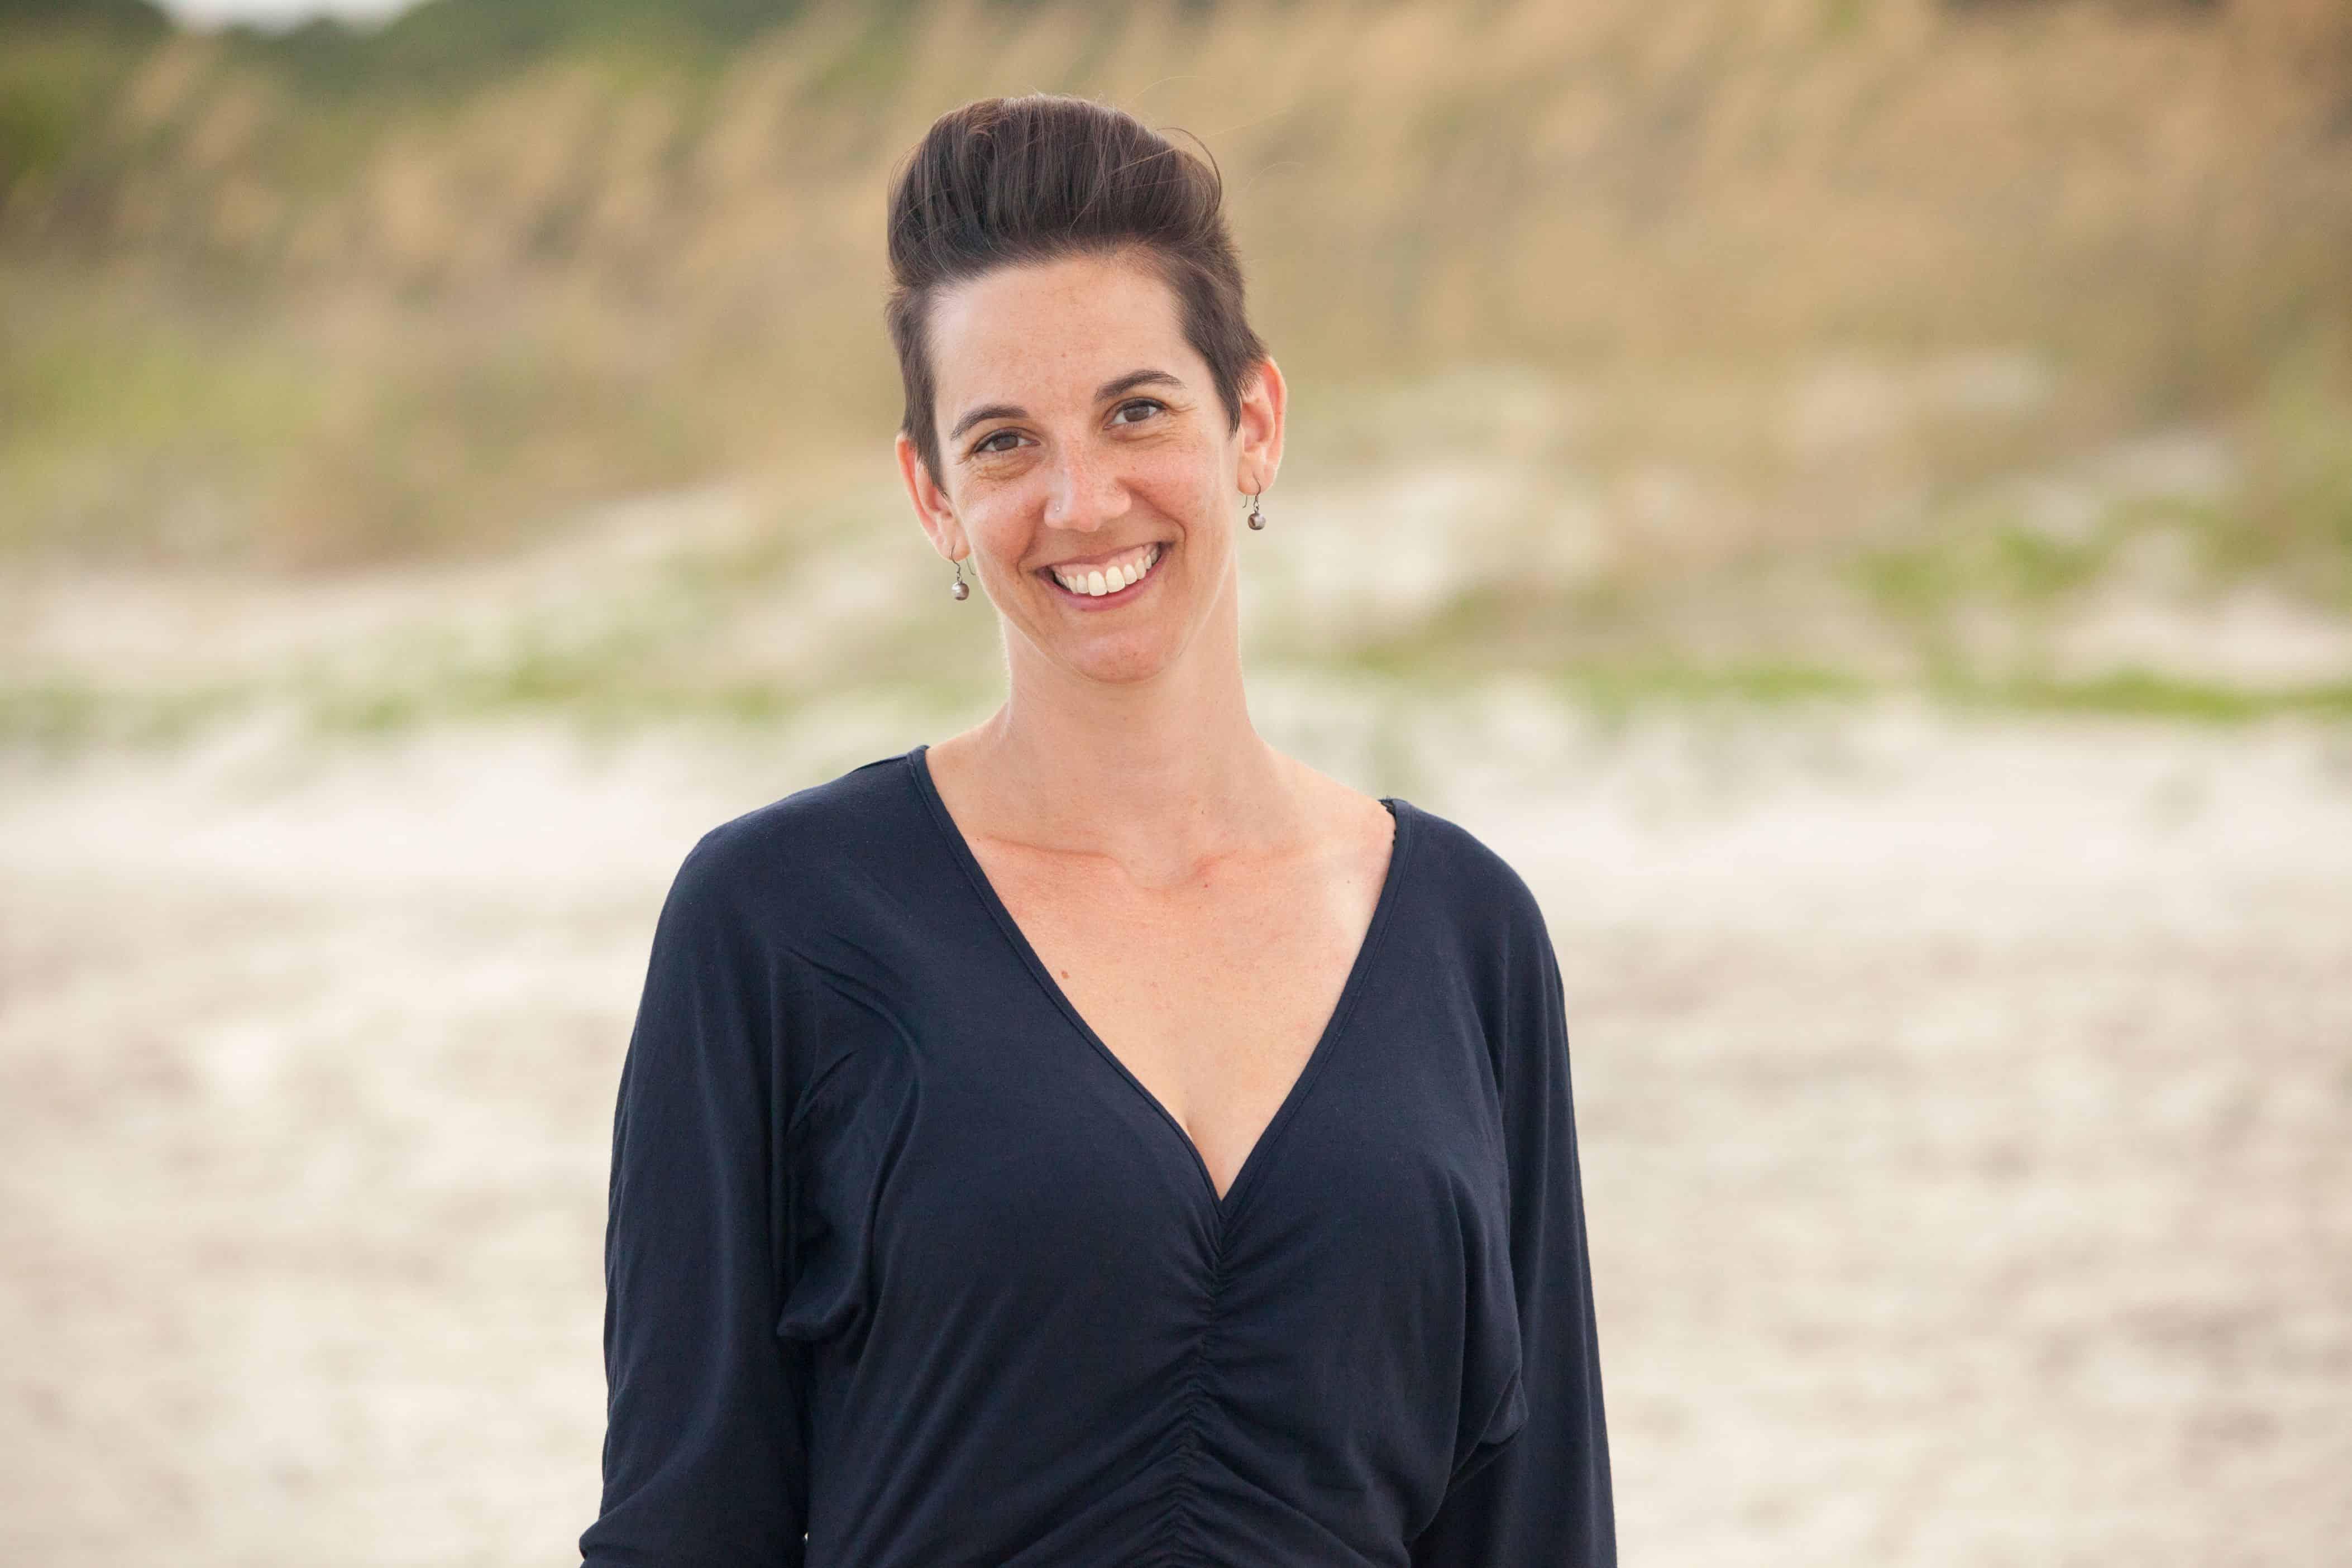 Katherine makes good money through transcription jobs. She's a full time transcriptionist